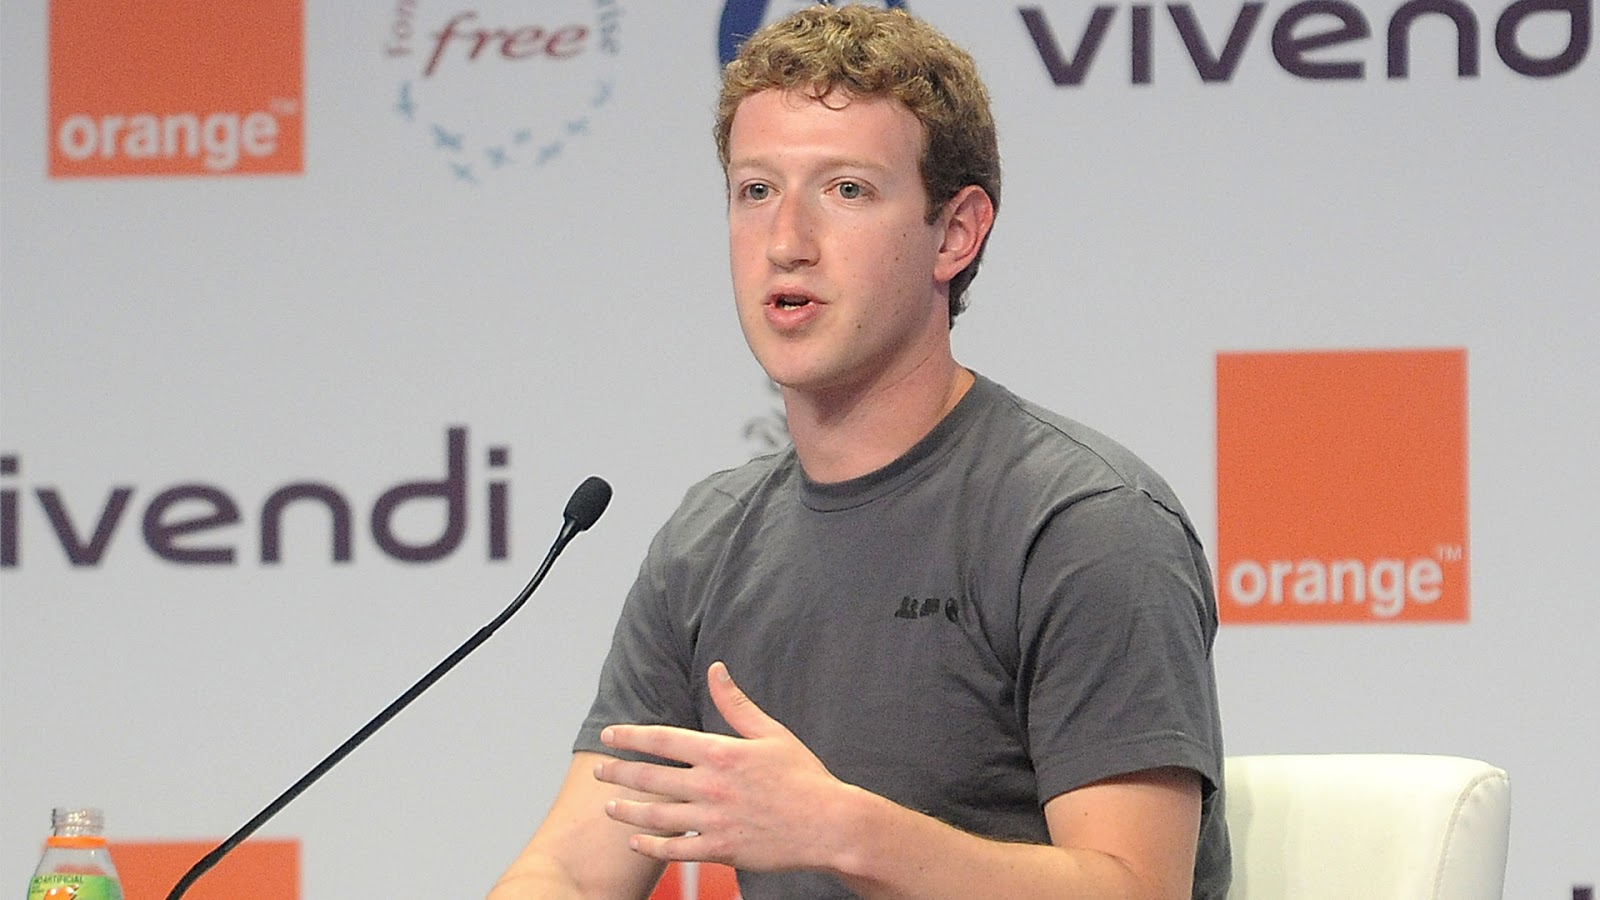 download image mark zuckerberg - photo #35